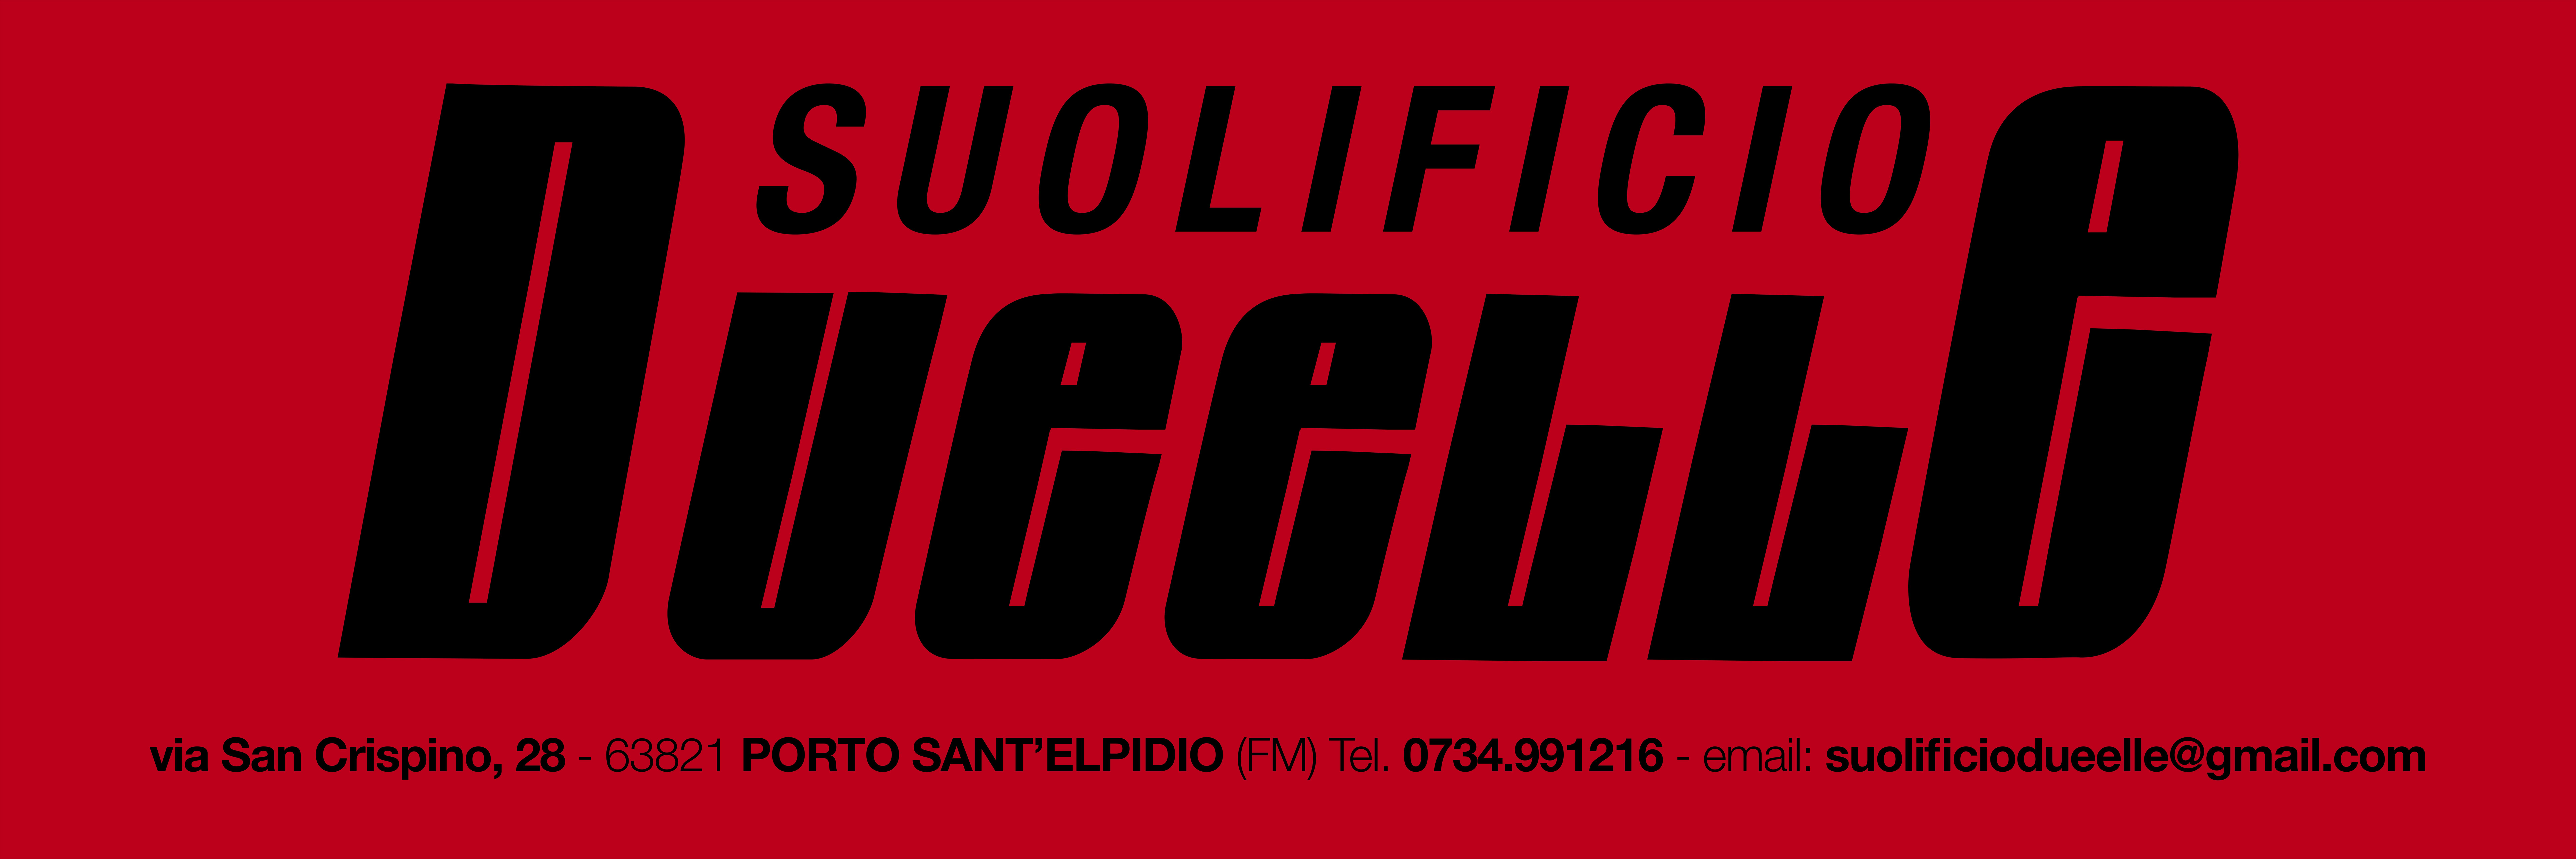 logo duelle